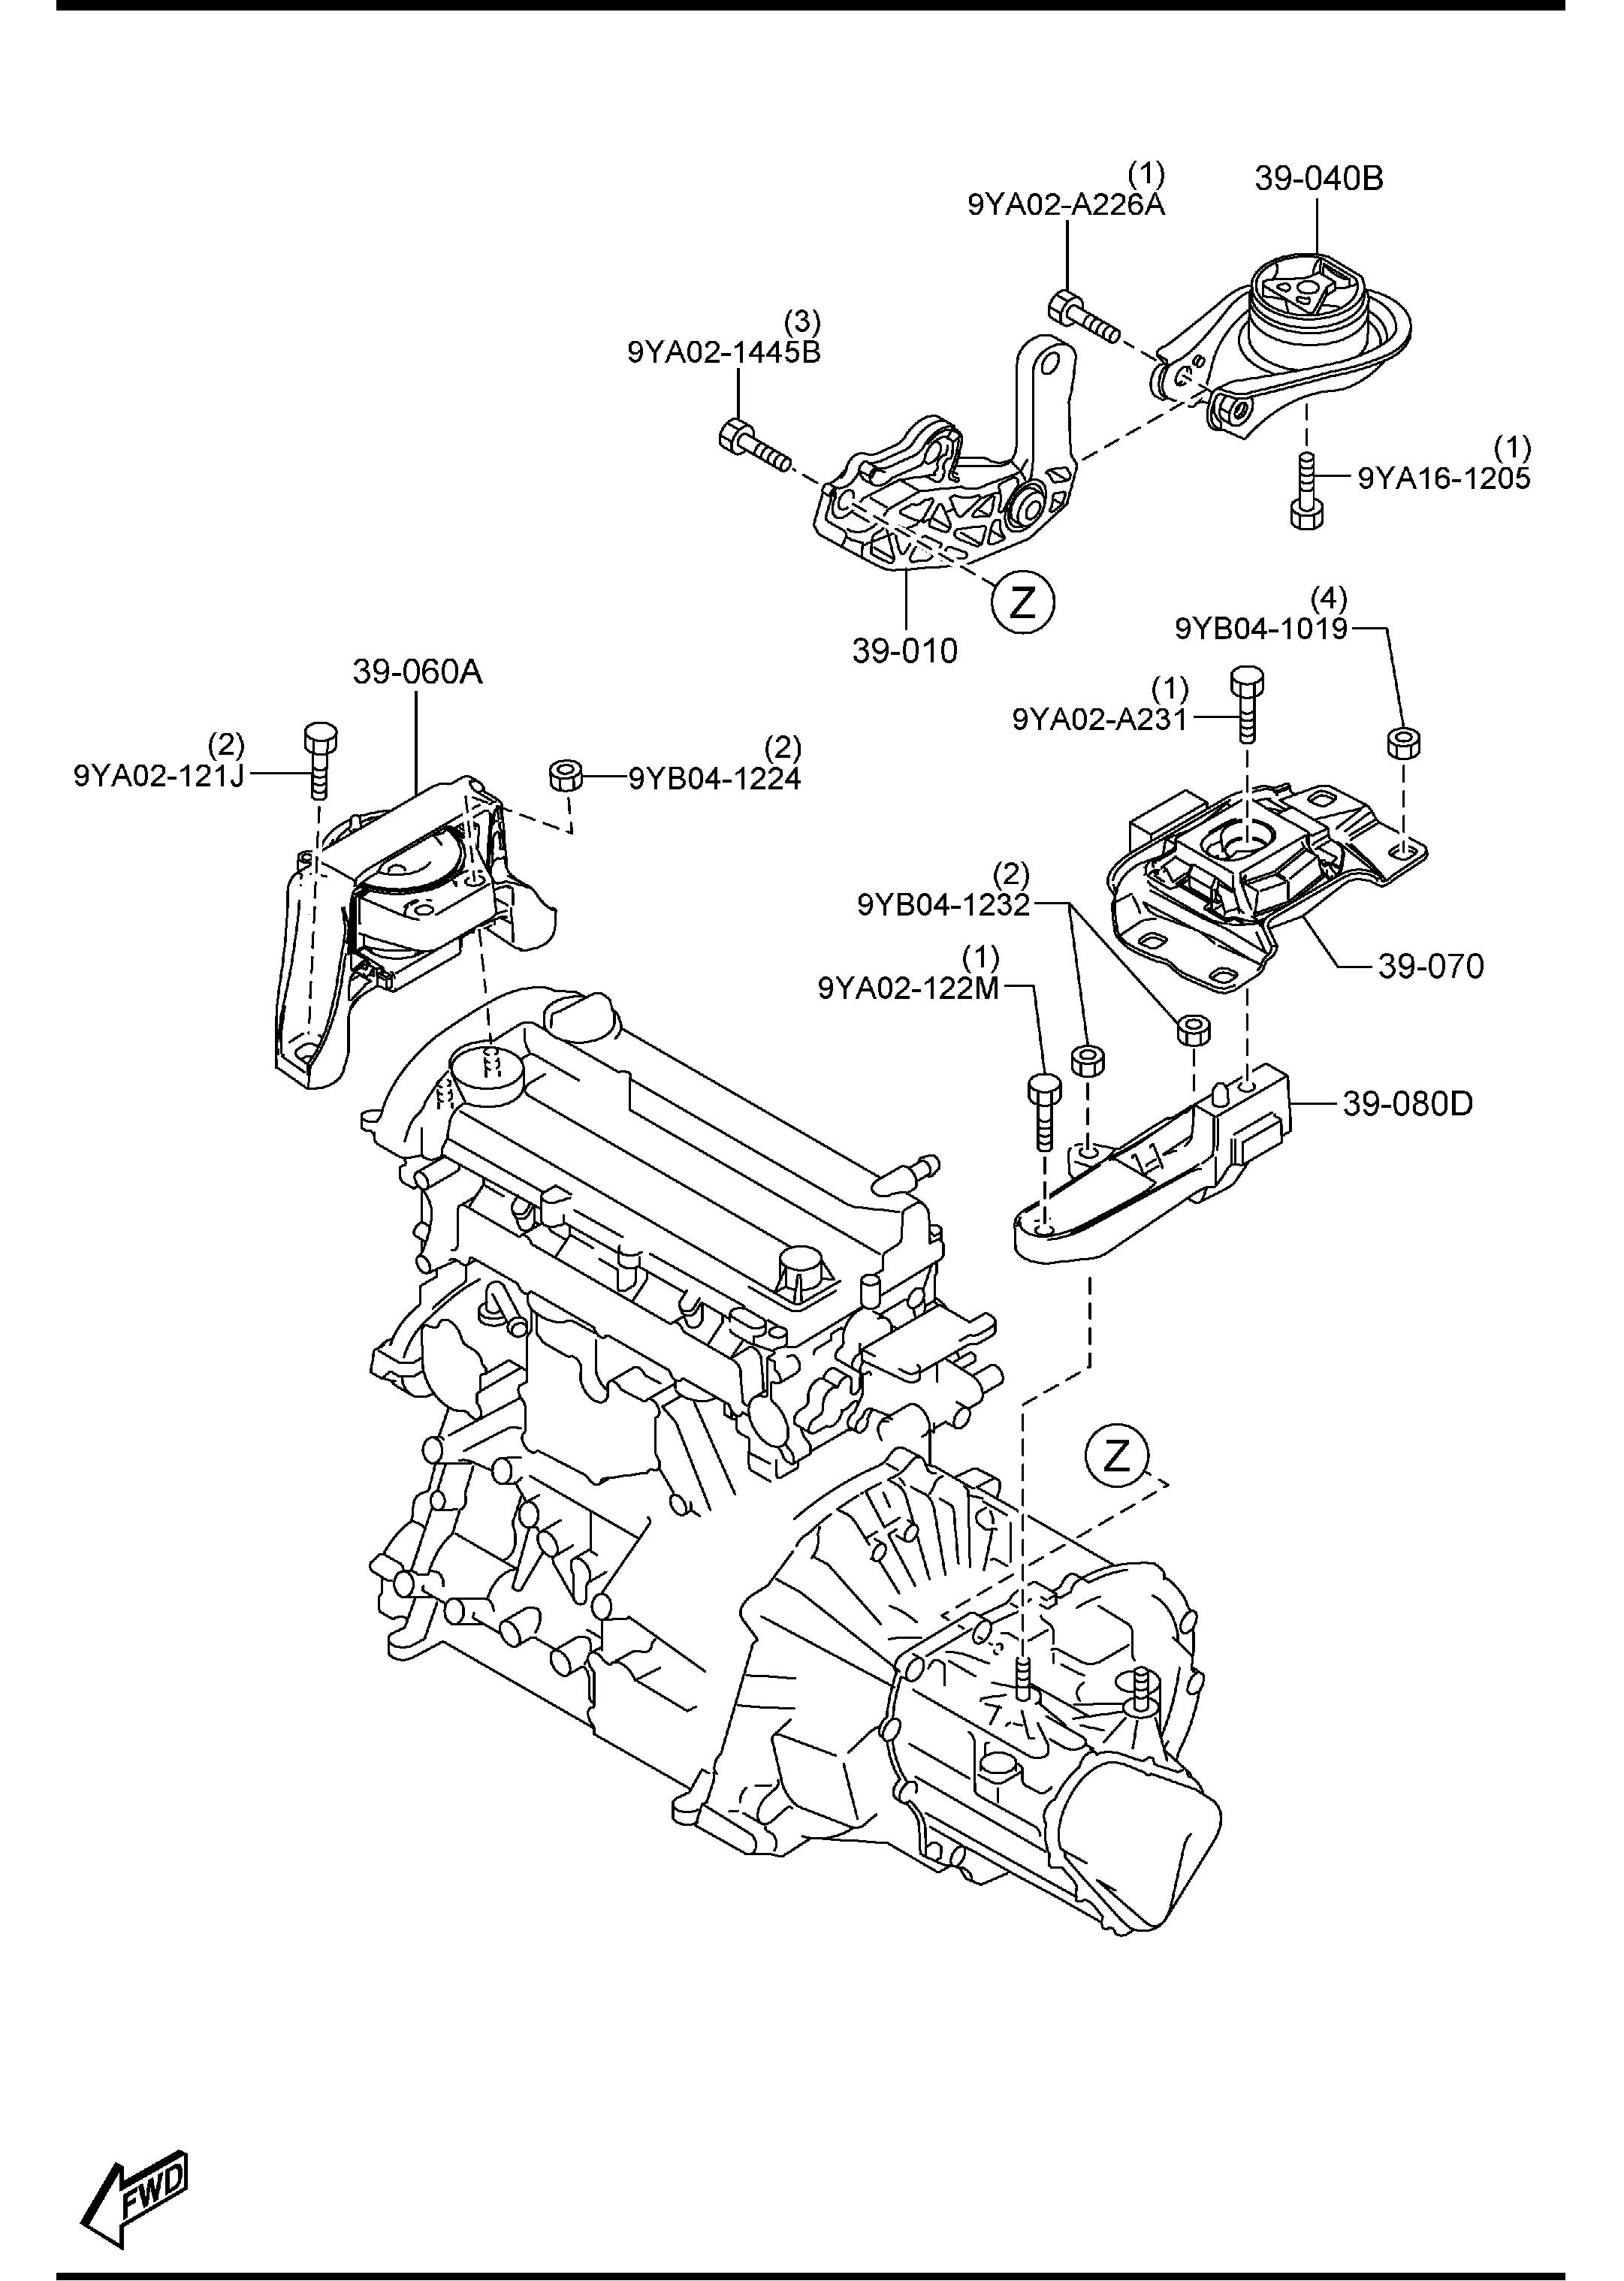 tags: #99 mazda miata engine diagram#99 miata hoses diagram#2000 miata  radio wiring diagram#skyactiv mazda miata 2018#1999 mazda miata repair  manual#1999